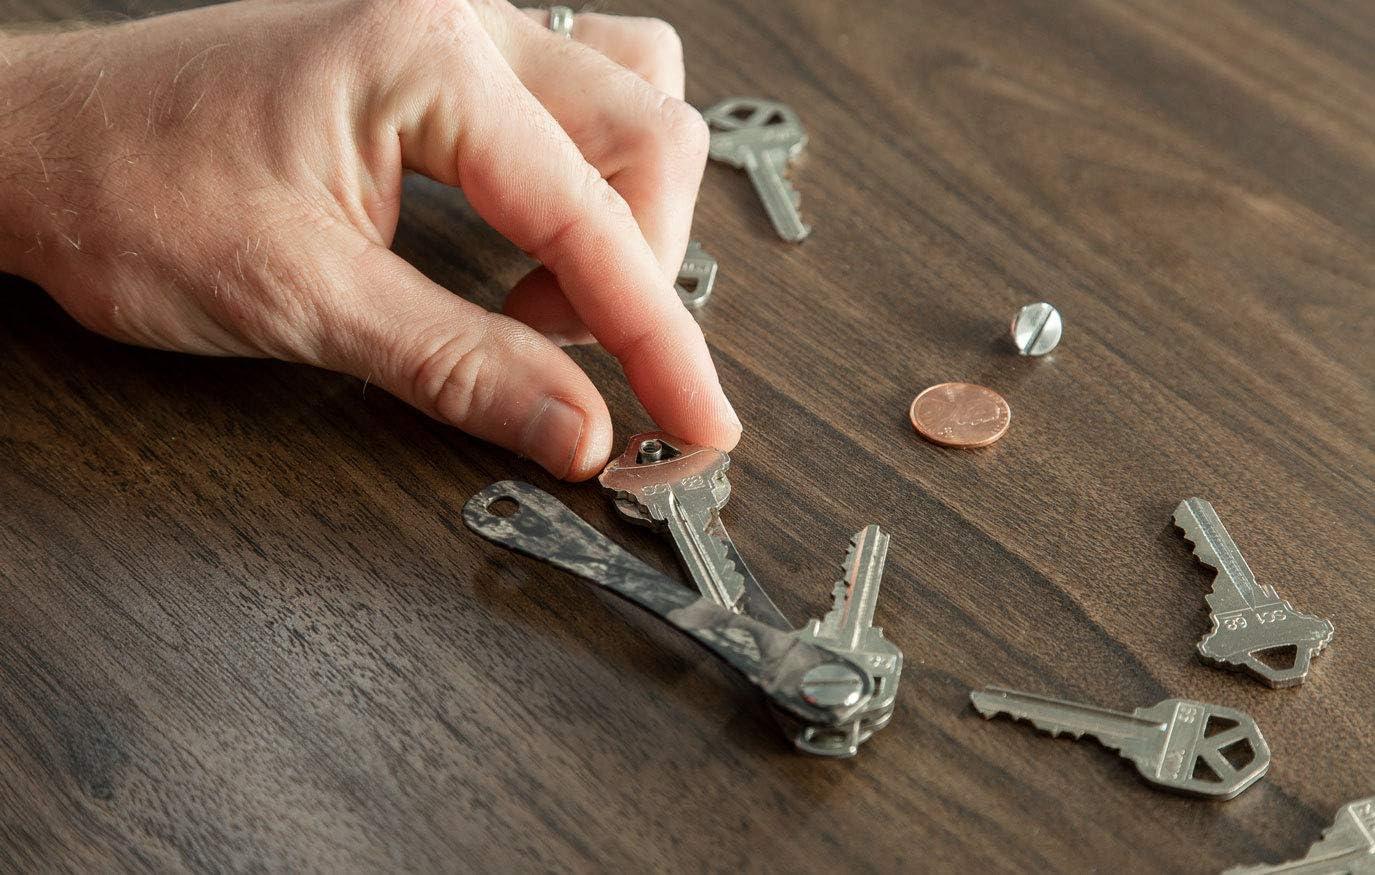 KeySmart up to 14 Keys Compact Key Holder and Keychain Organizer